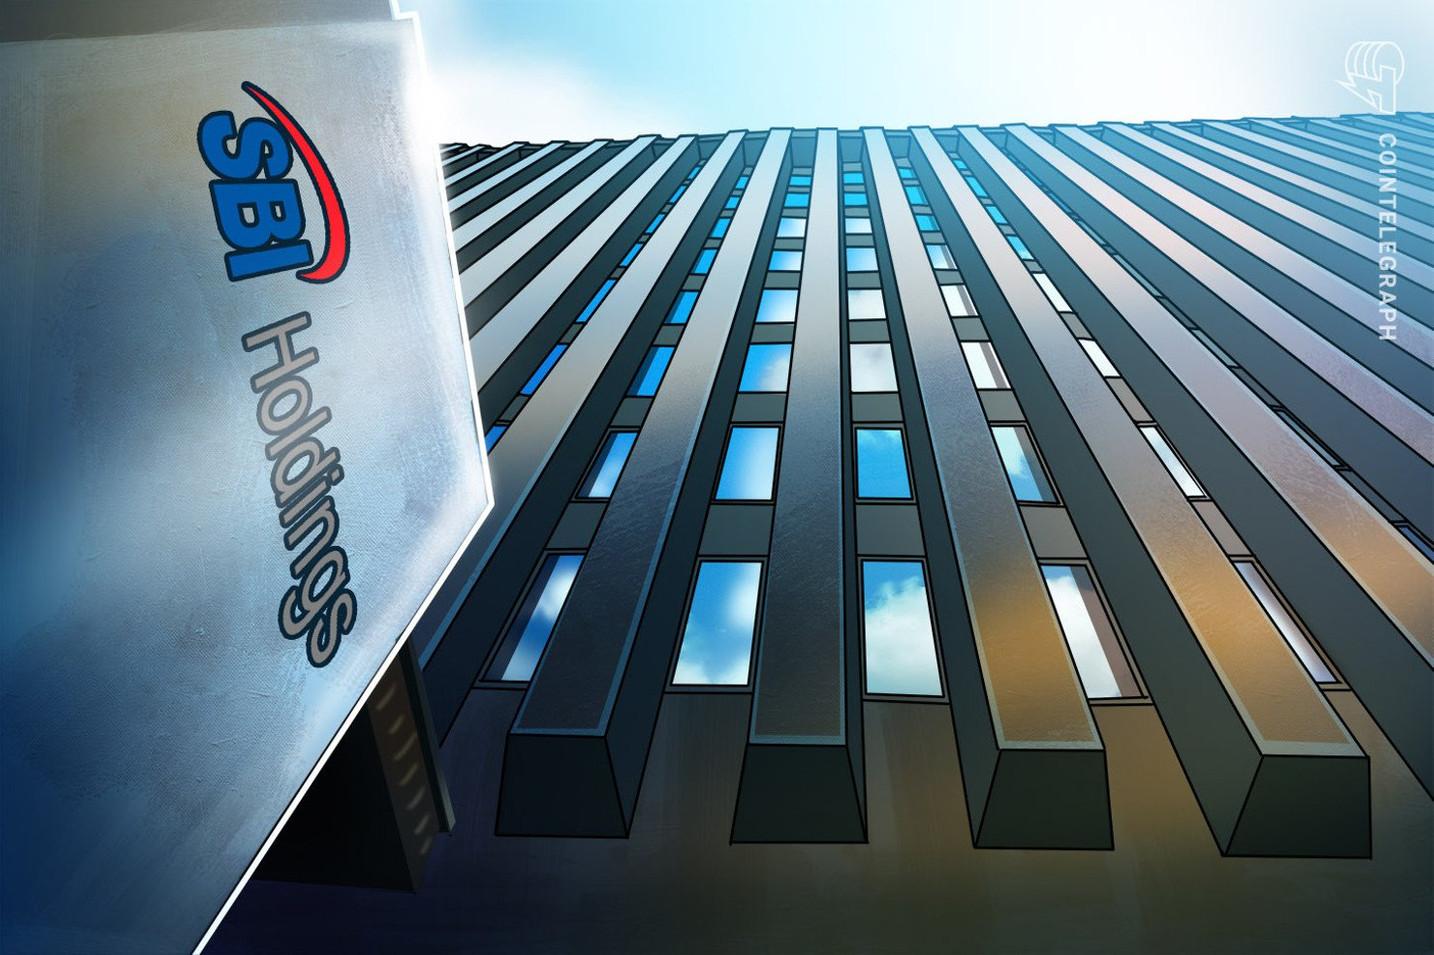 SBIがスイス証券取引所子会社と合弁会社設立、シンガポールでデジタル資産の発行や取引業務